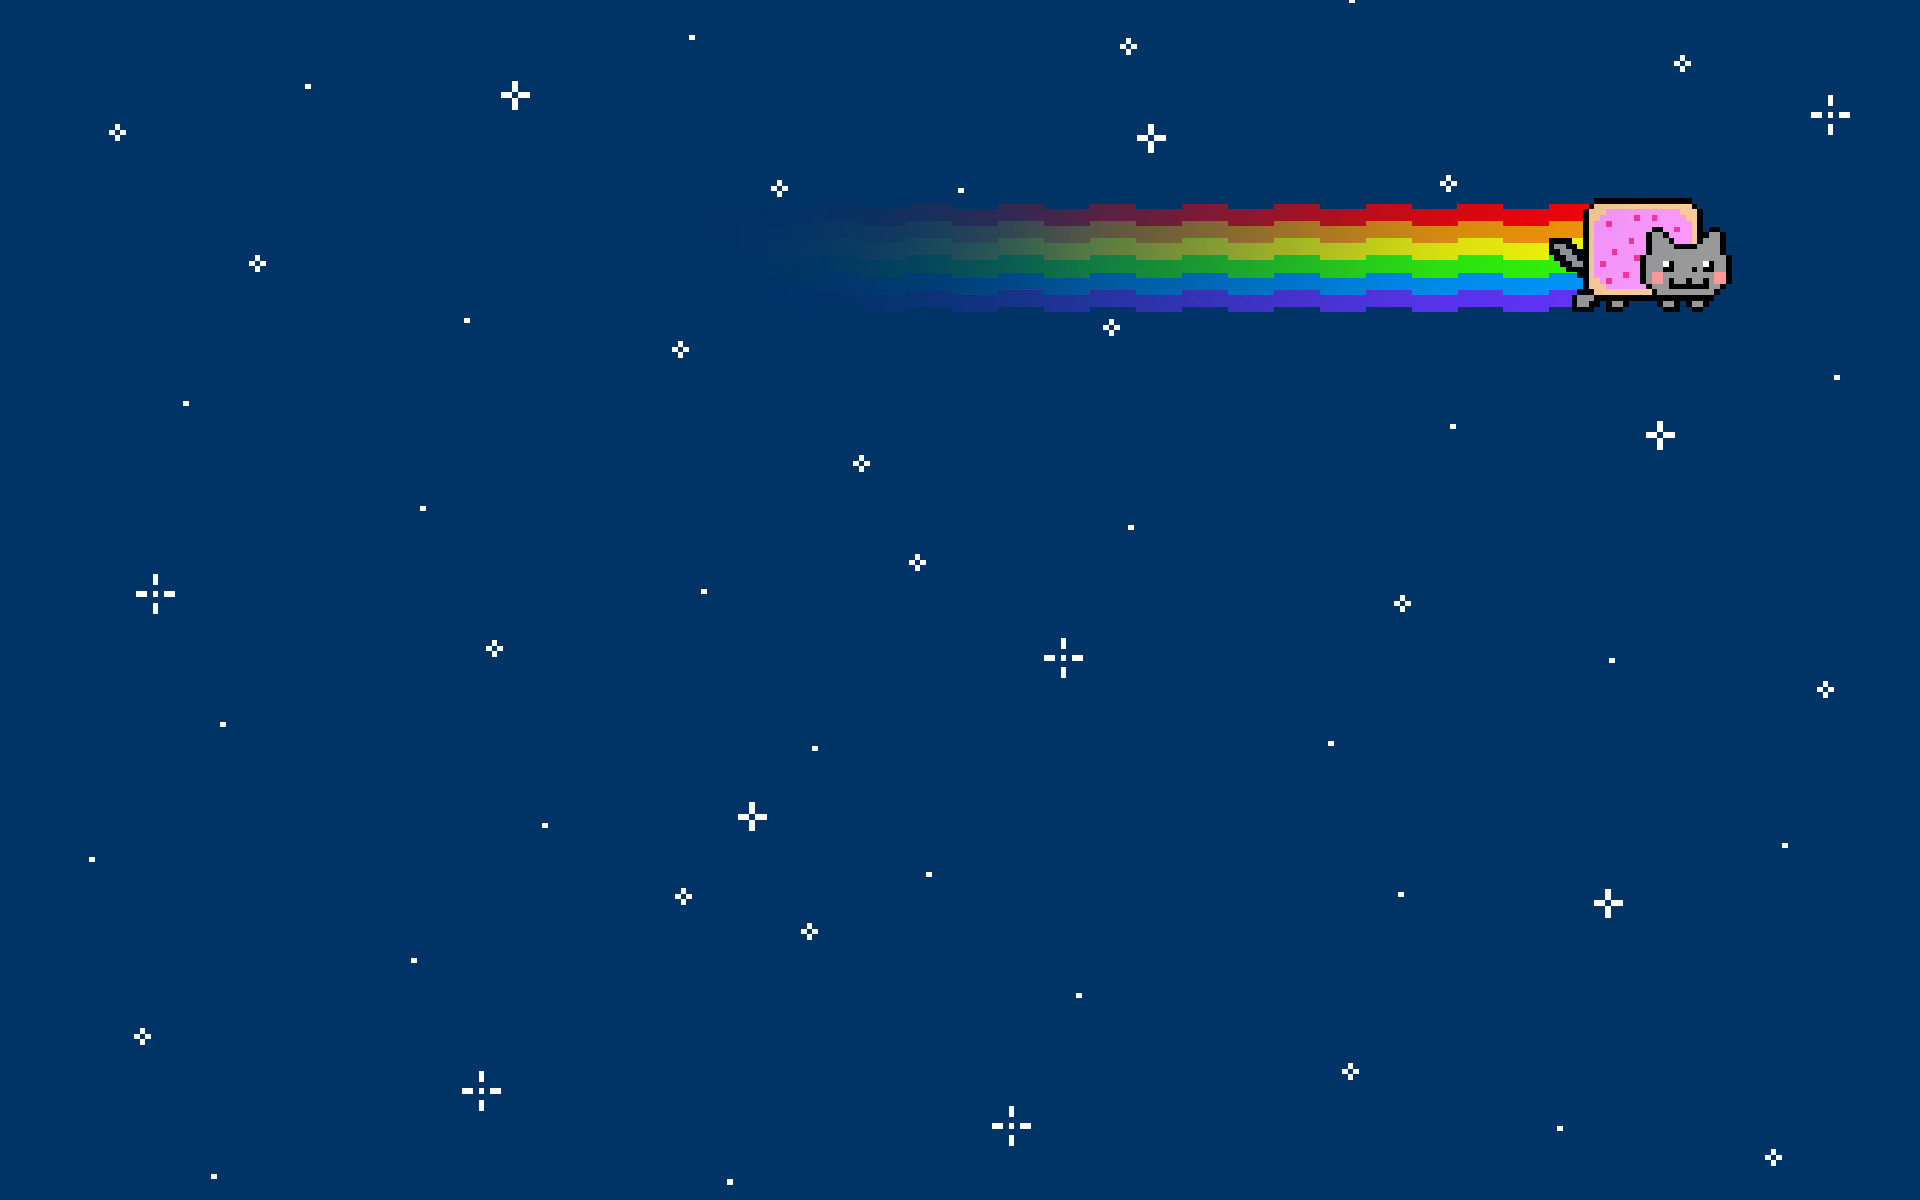 Outer space cats rainbows nyan cat wallpaper | | 21786 |  WallpaperUP